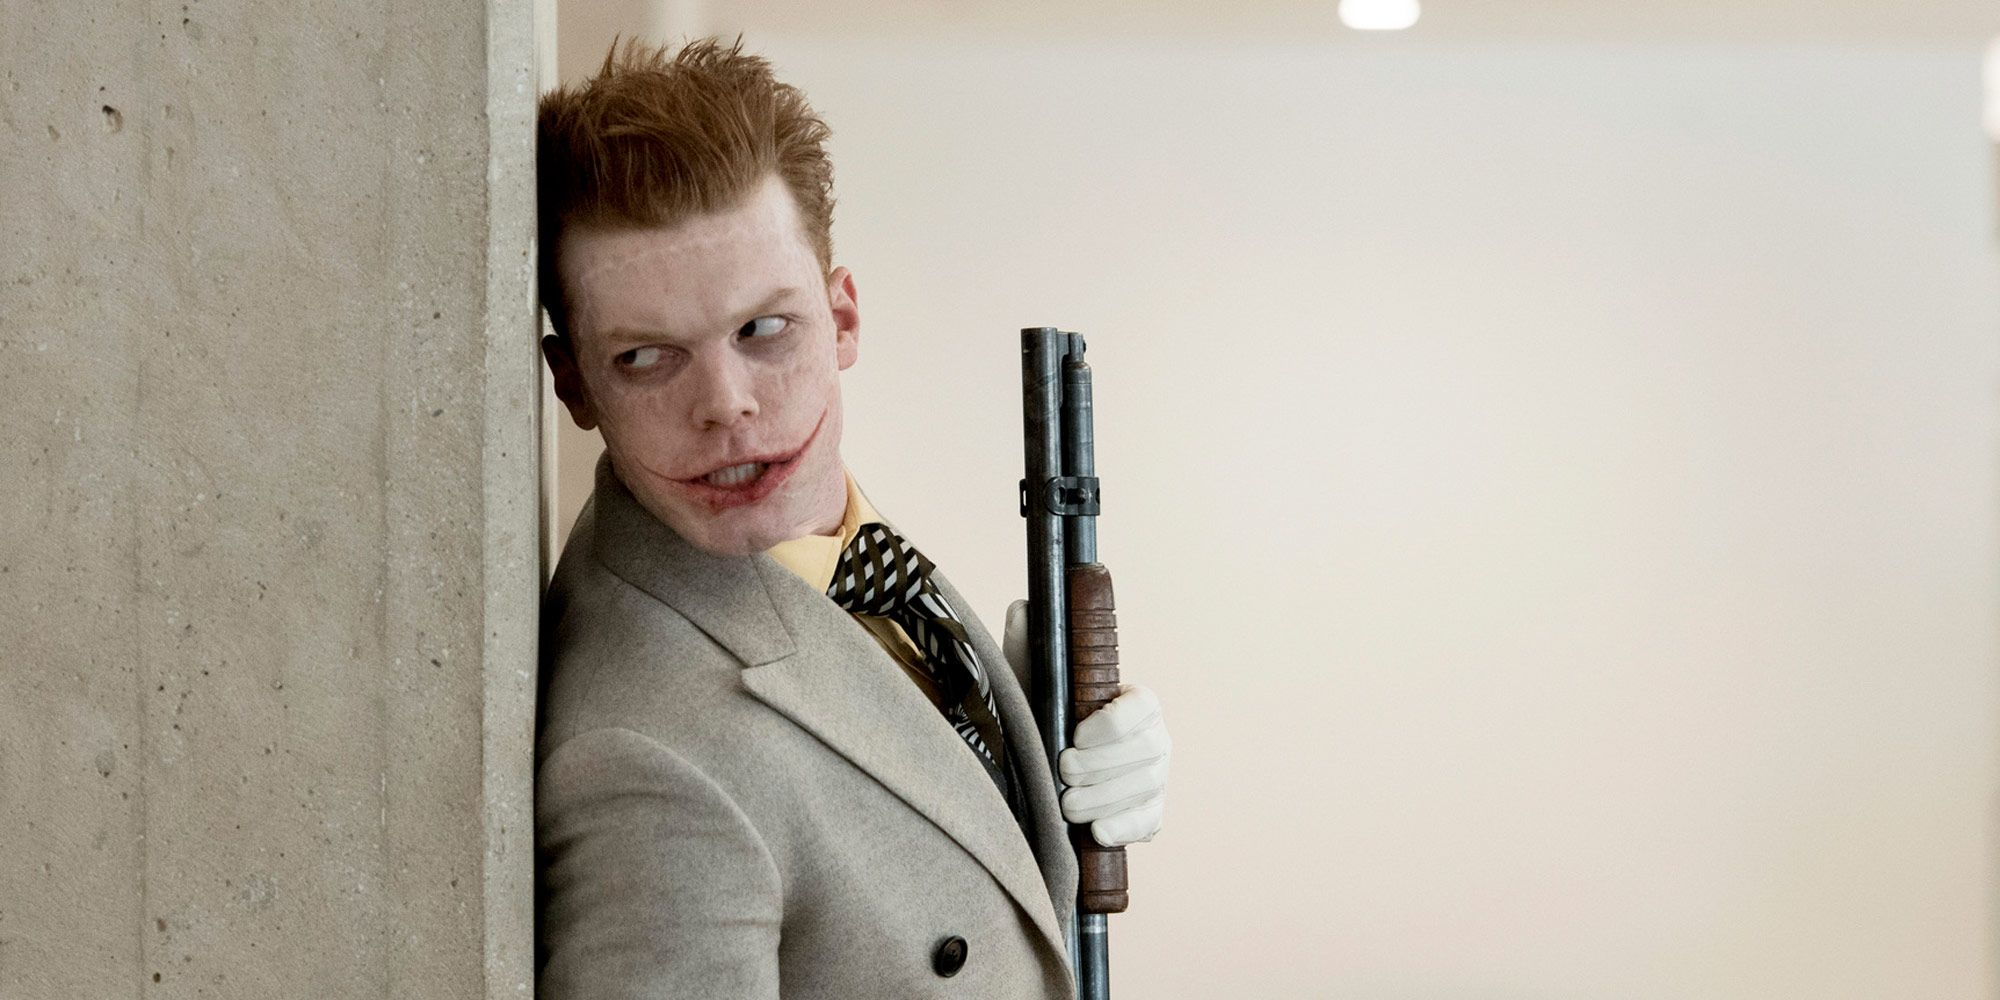 Cameron Monaghan, Jerome, Gotham, Season 4, Episode 17, 'Mandatory Brunch Meeting'